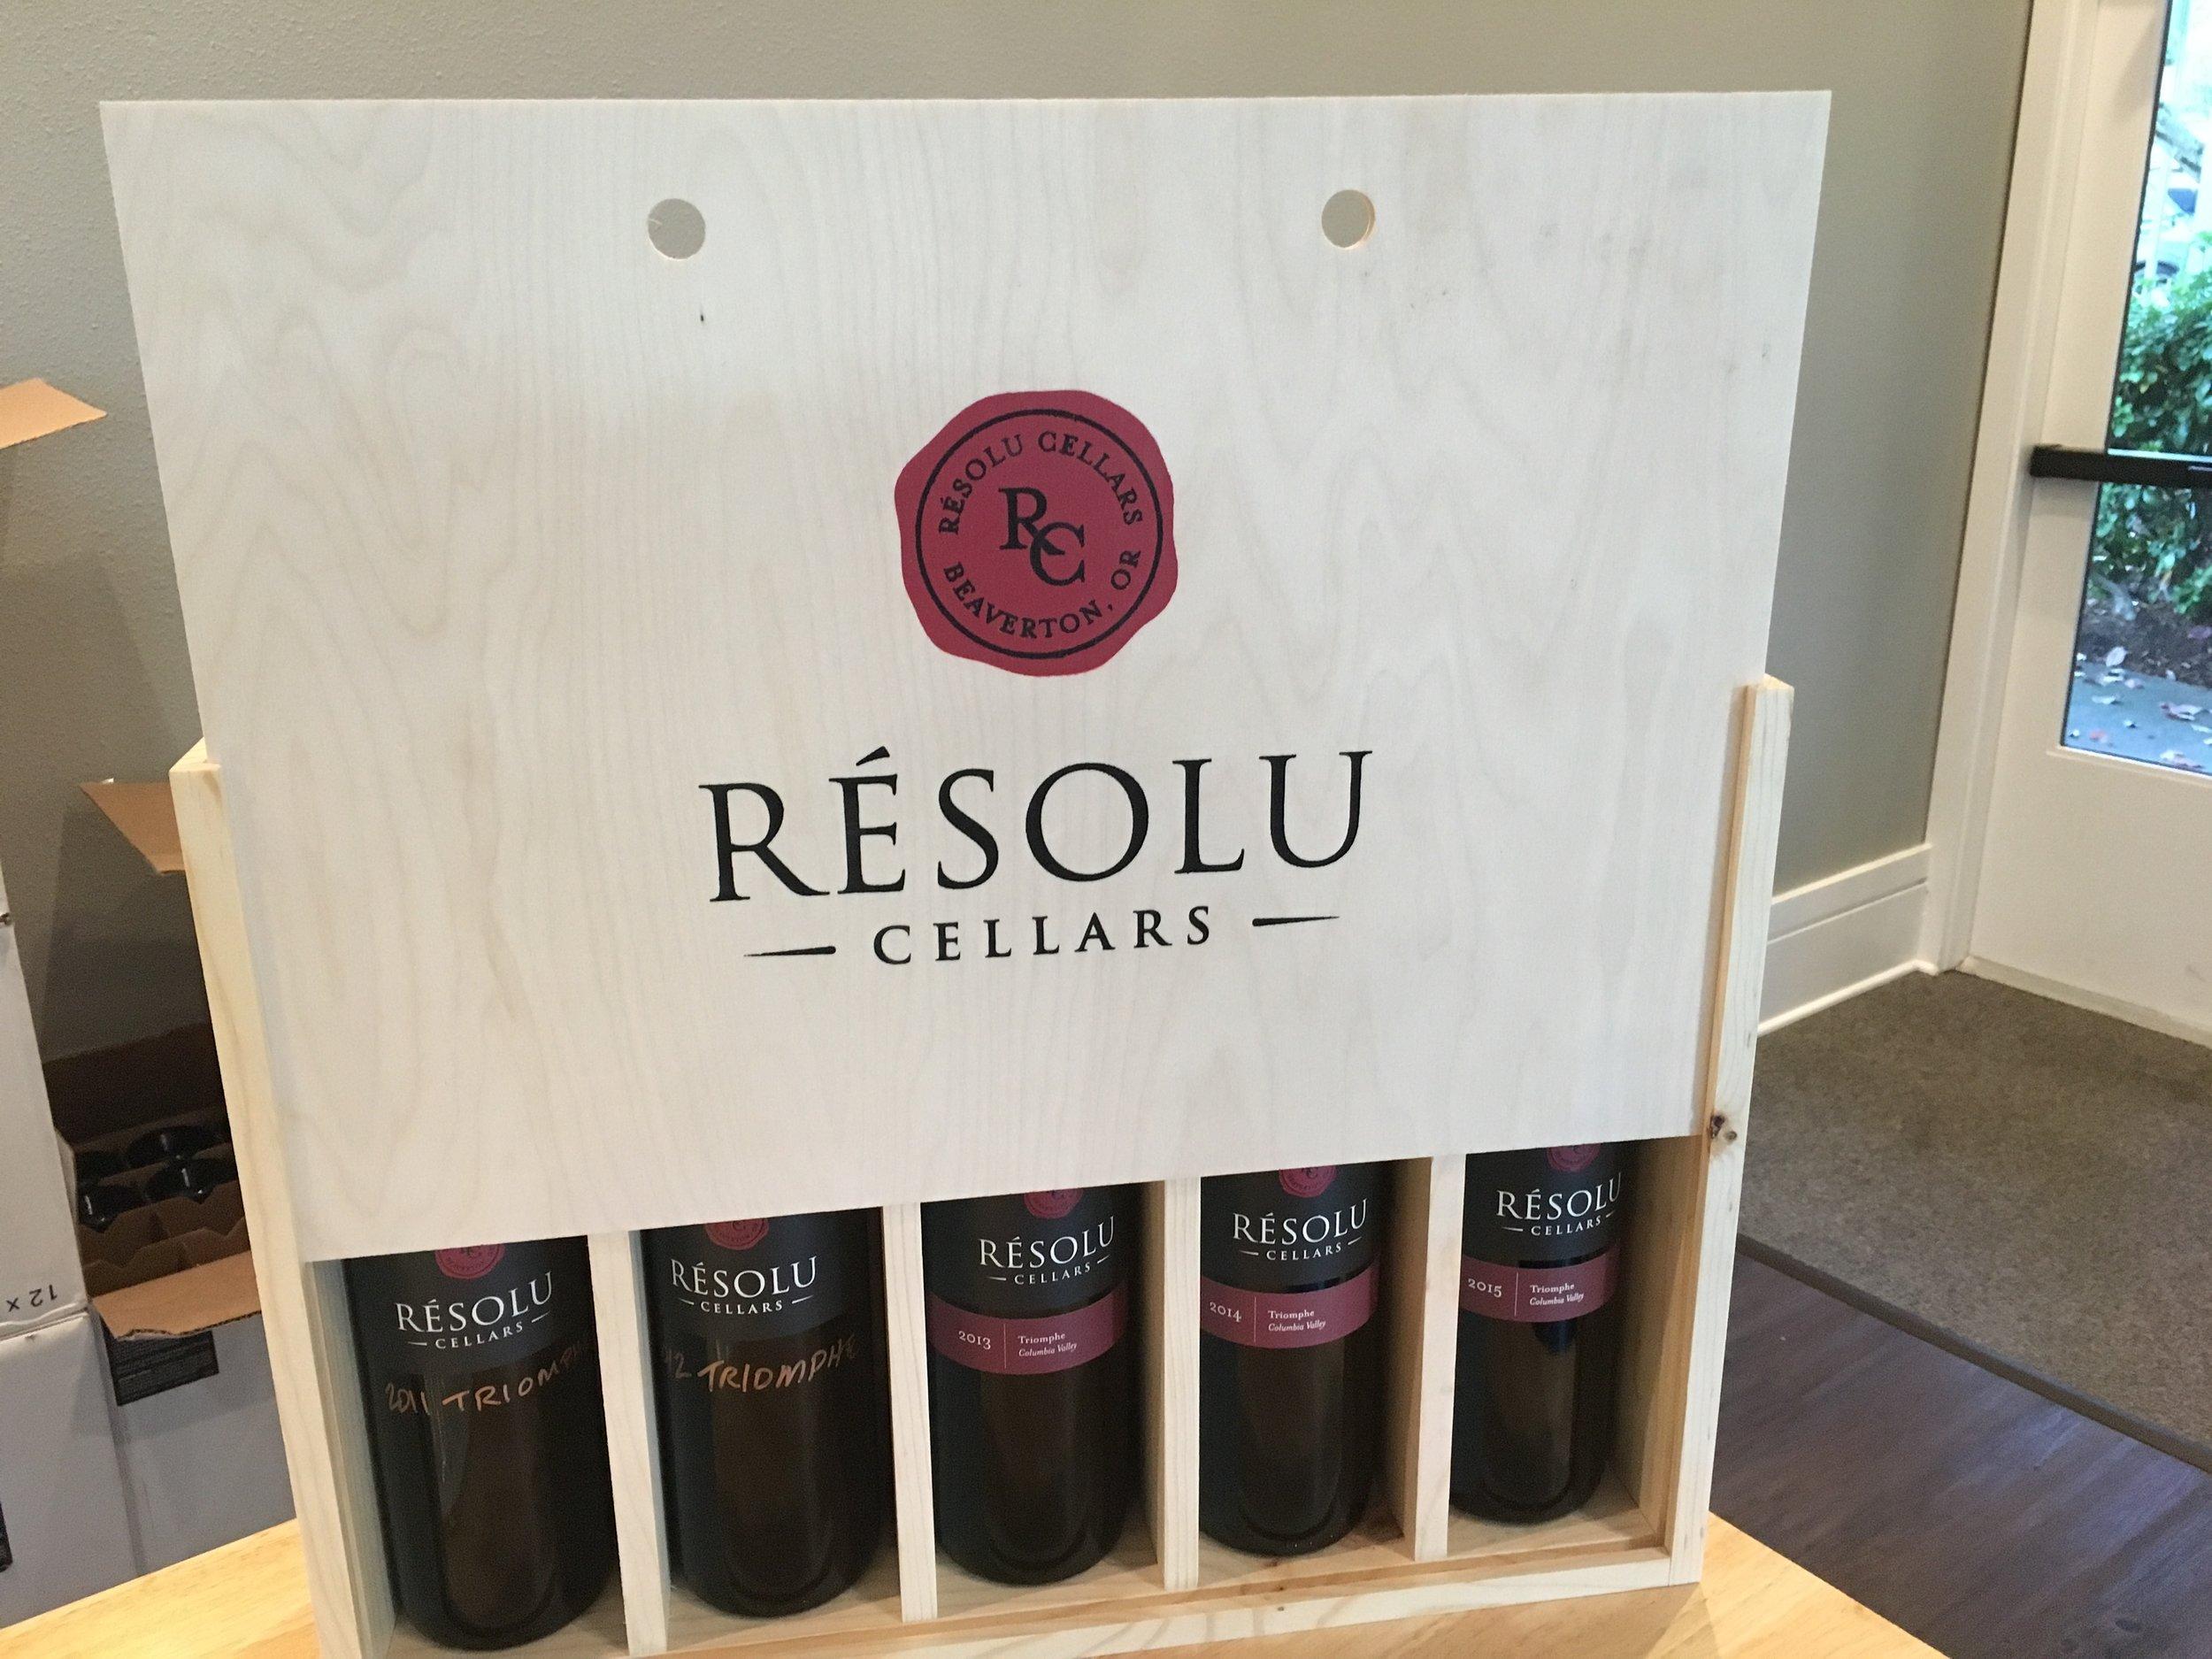 5 bottle wine box with screen print logo